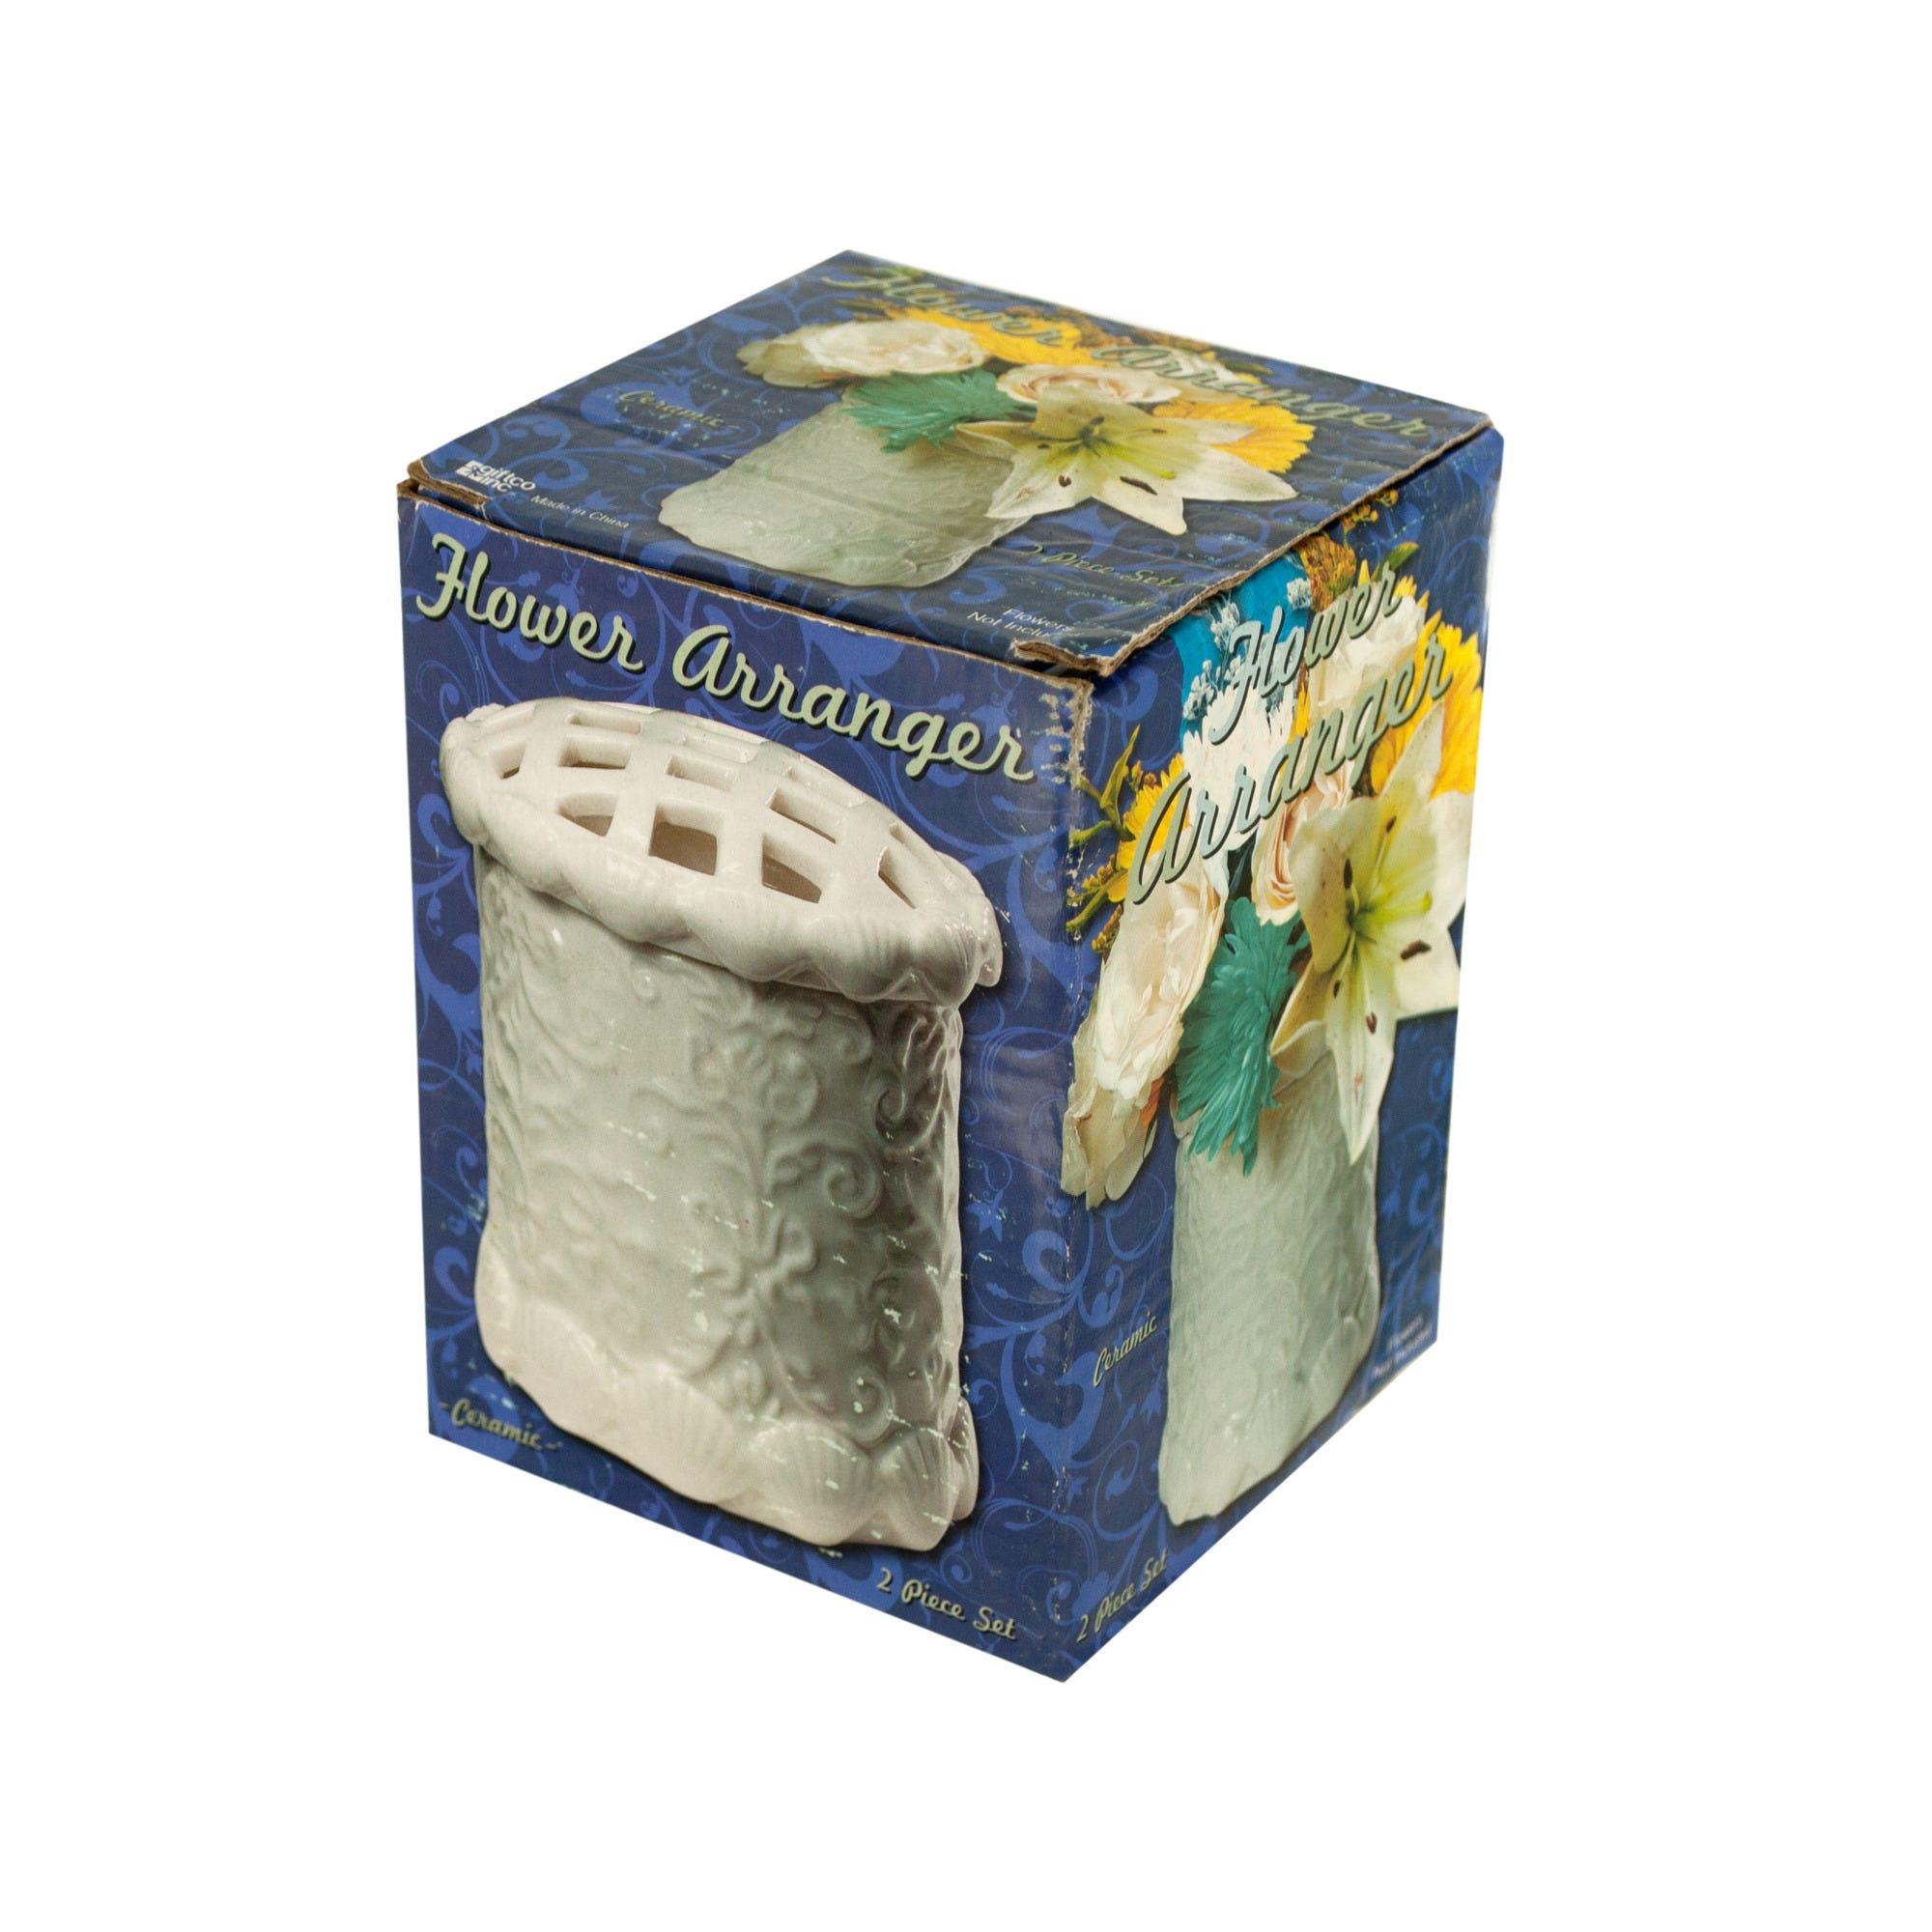 decorative-ceramic-flower-arranger-VASE